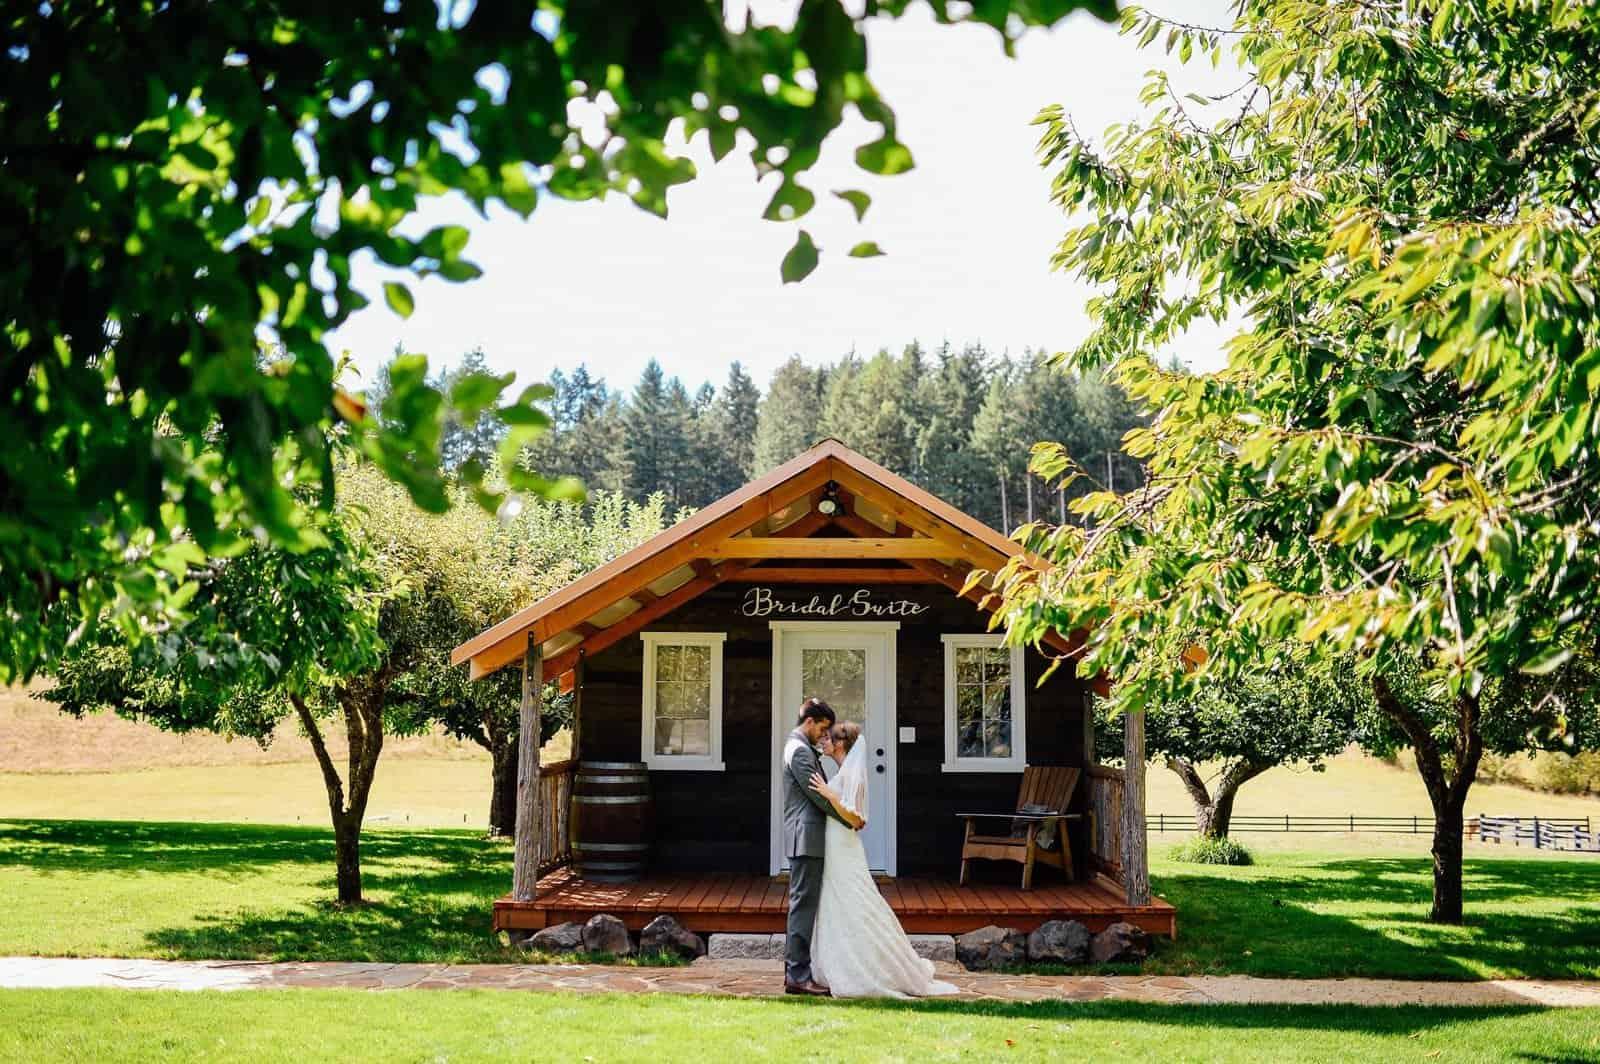 1920w-Couple_Bridal Suite_Tso